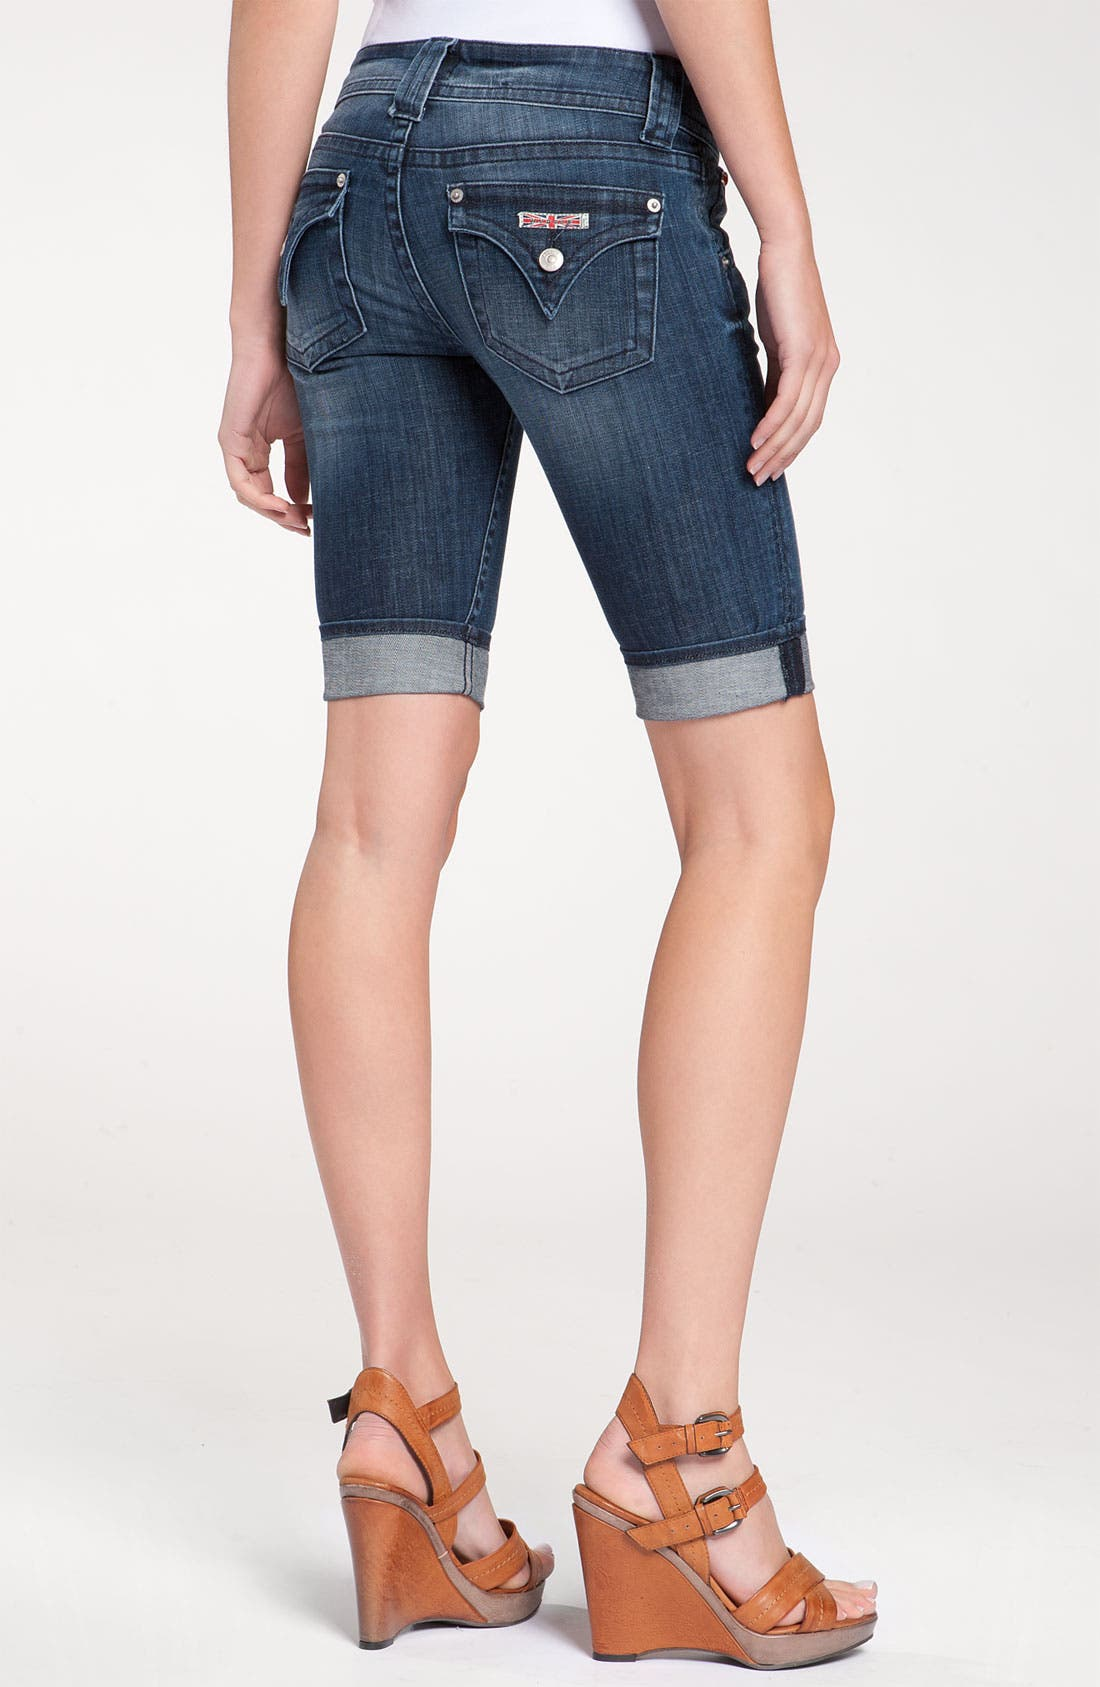 Alternate Image 1 Selected - Hudson Jeans 'Palerme' Cuff Bermuda Shorts (Nantucket Island Wash)